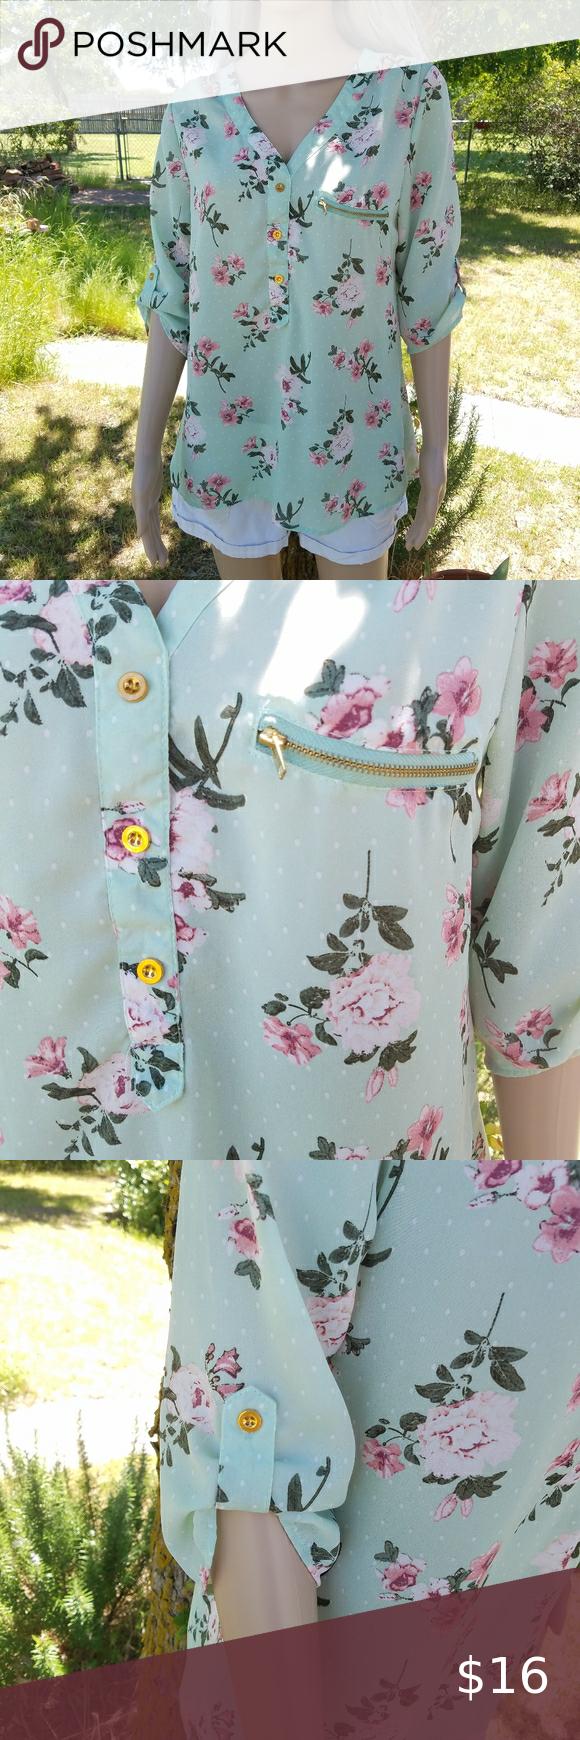 Photo of Wishful Park Springtime Blouse Wishful Park Brand  Cute flow…